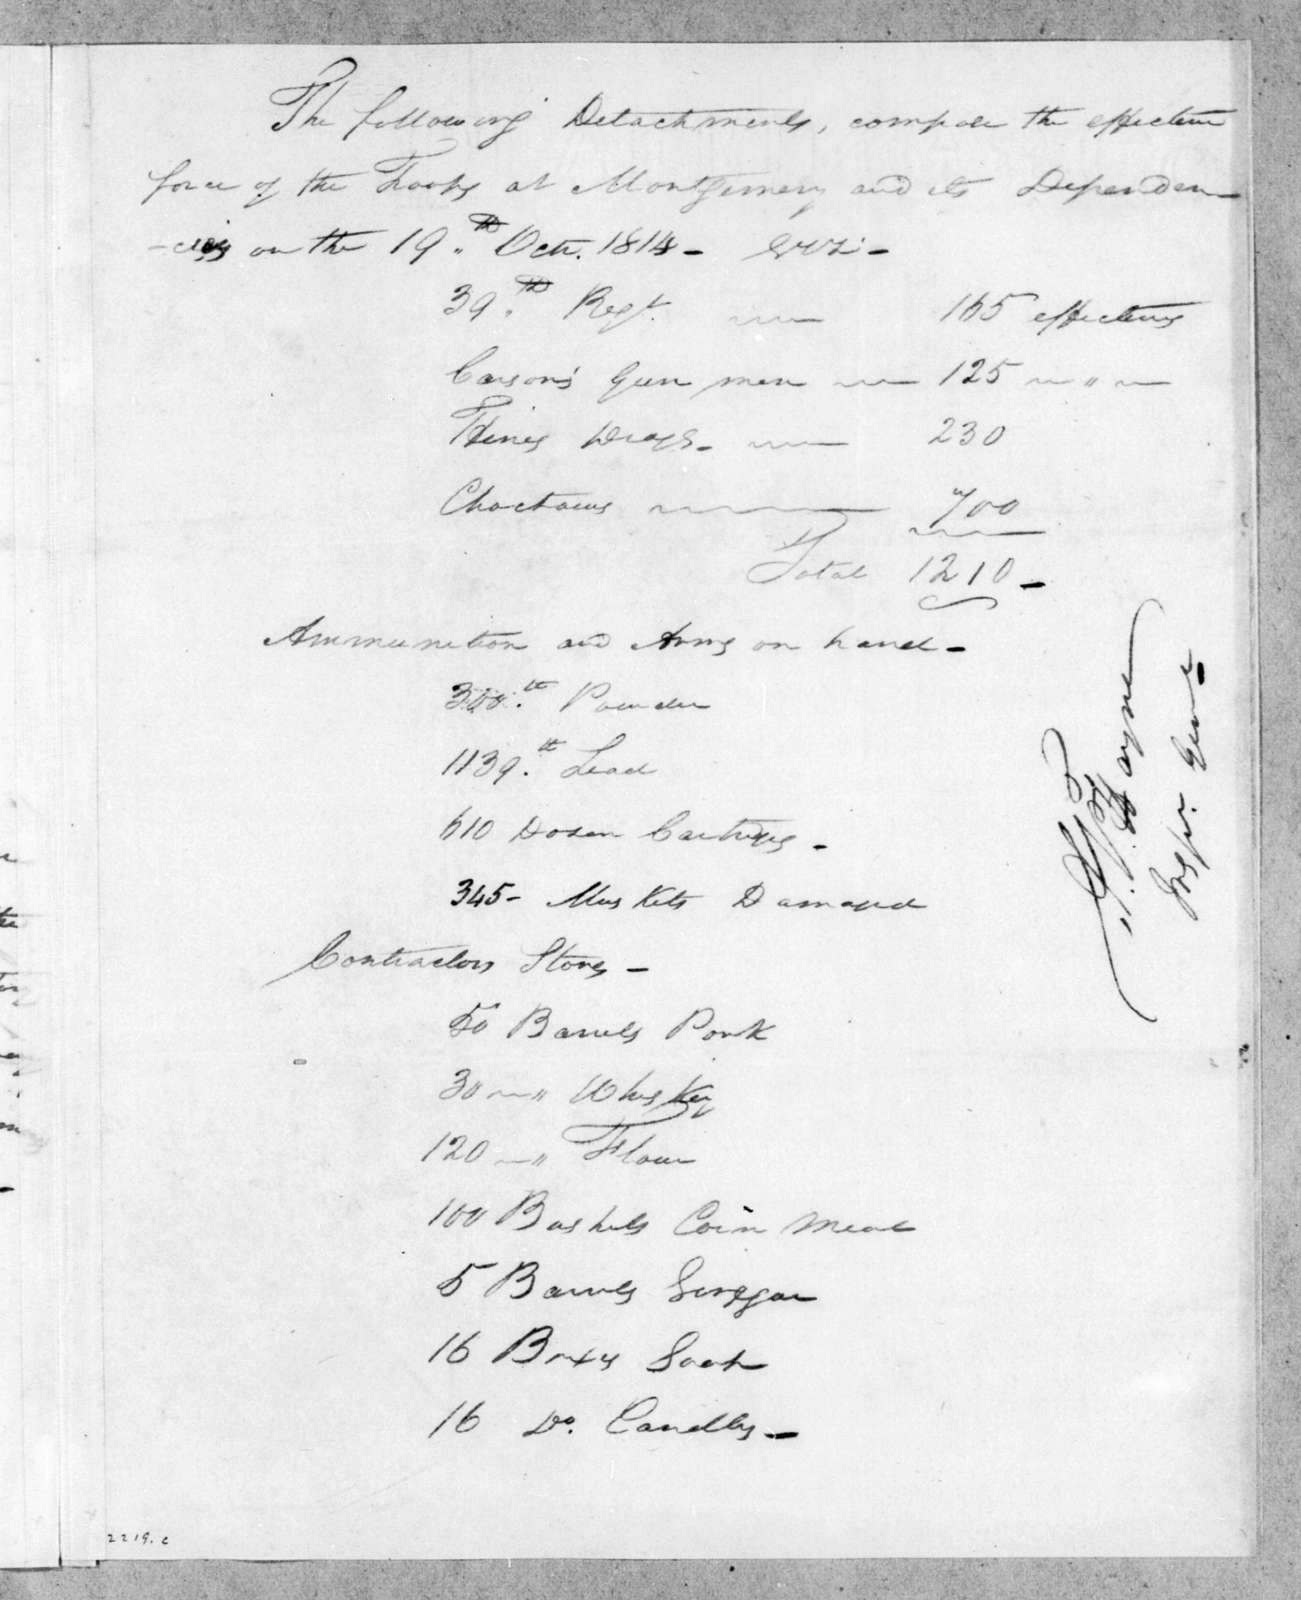 Arthur Peronneau Hayne to John Coffee, October 19, 1814